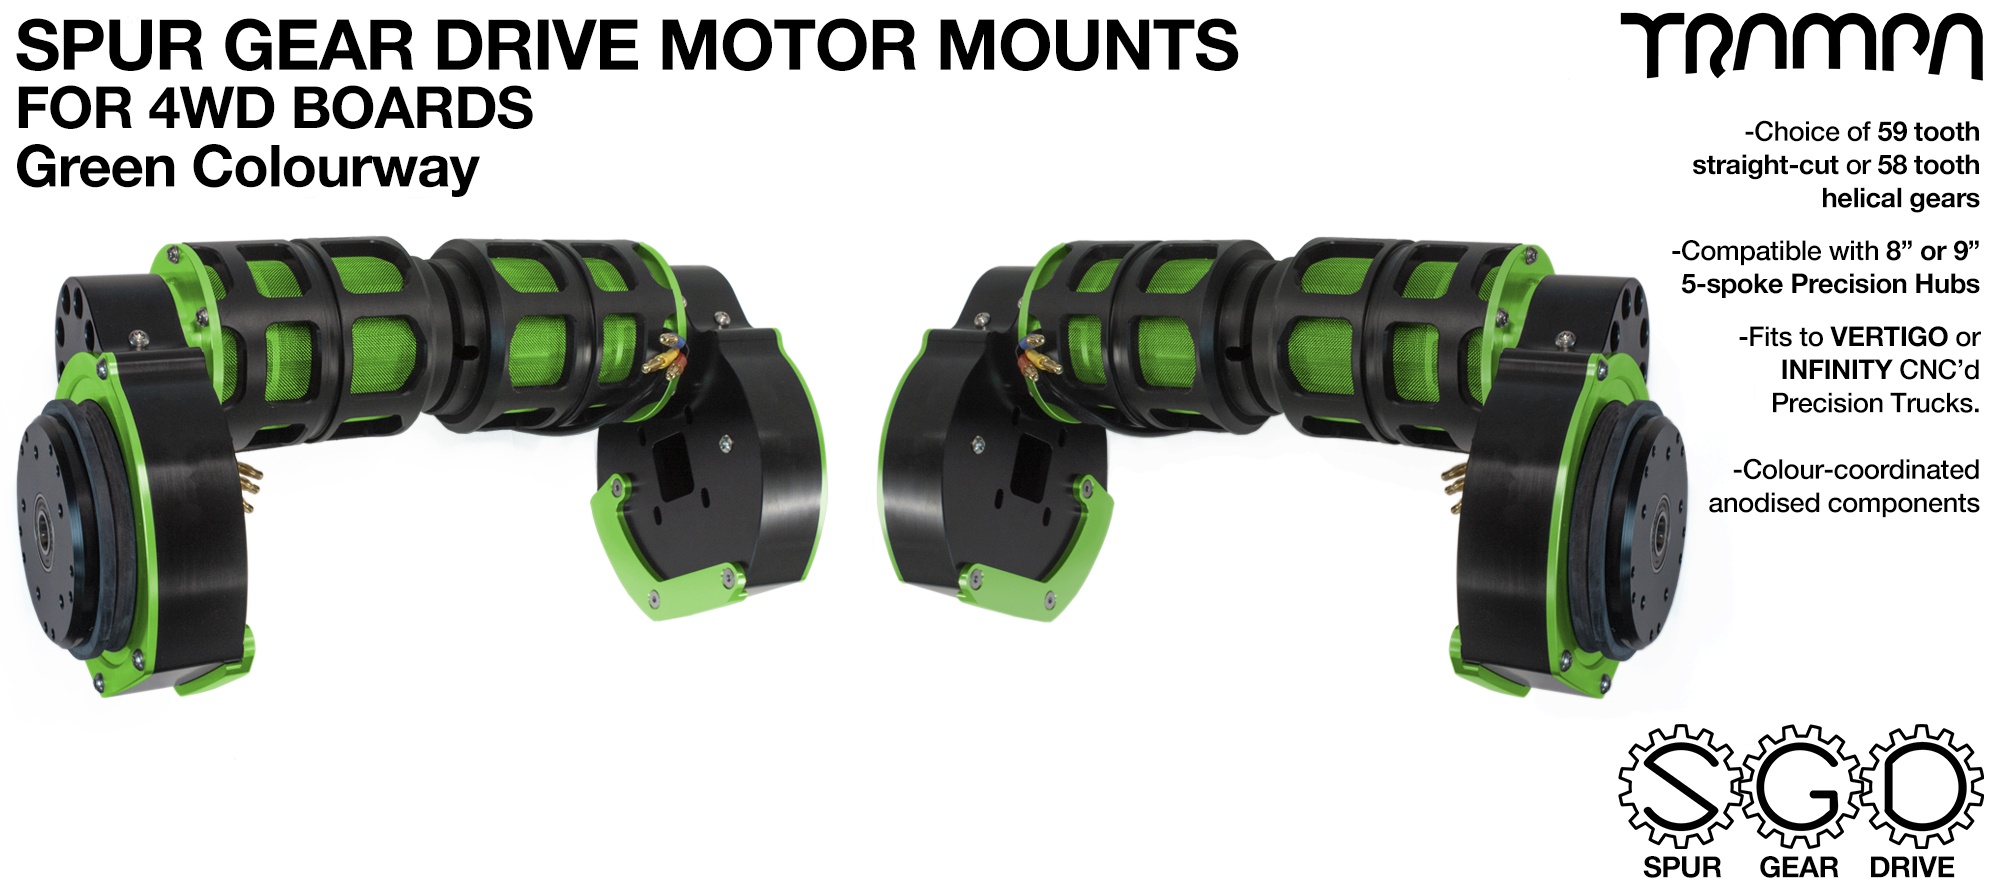 GREEN 4WD Spur Gear Drive Motor Mount